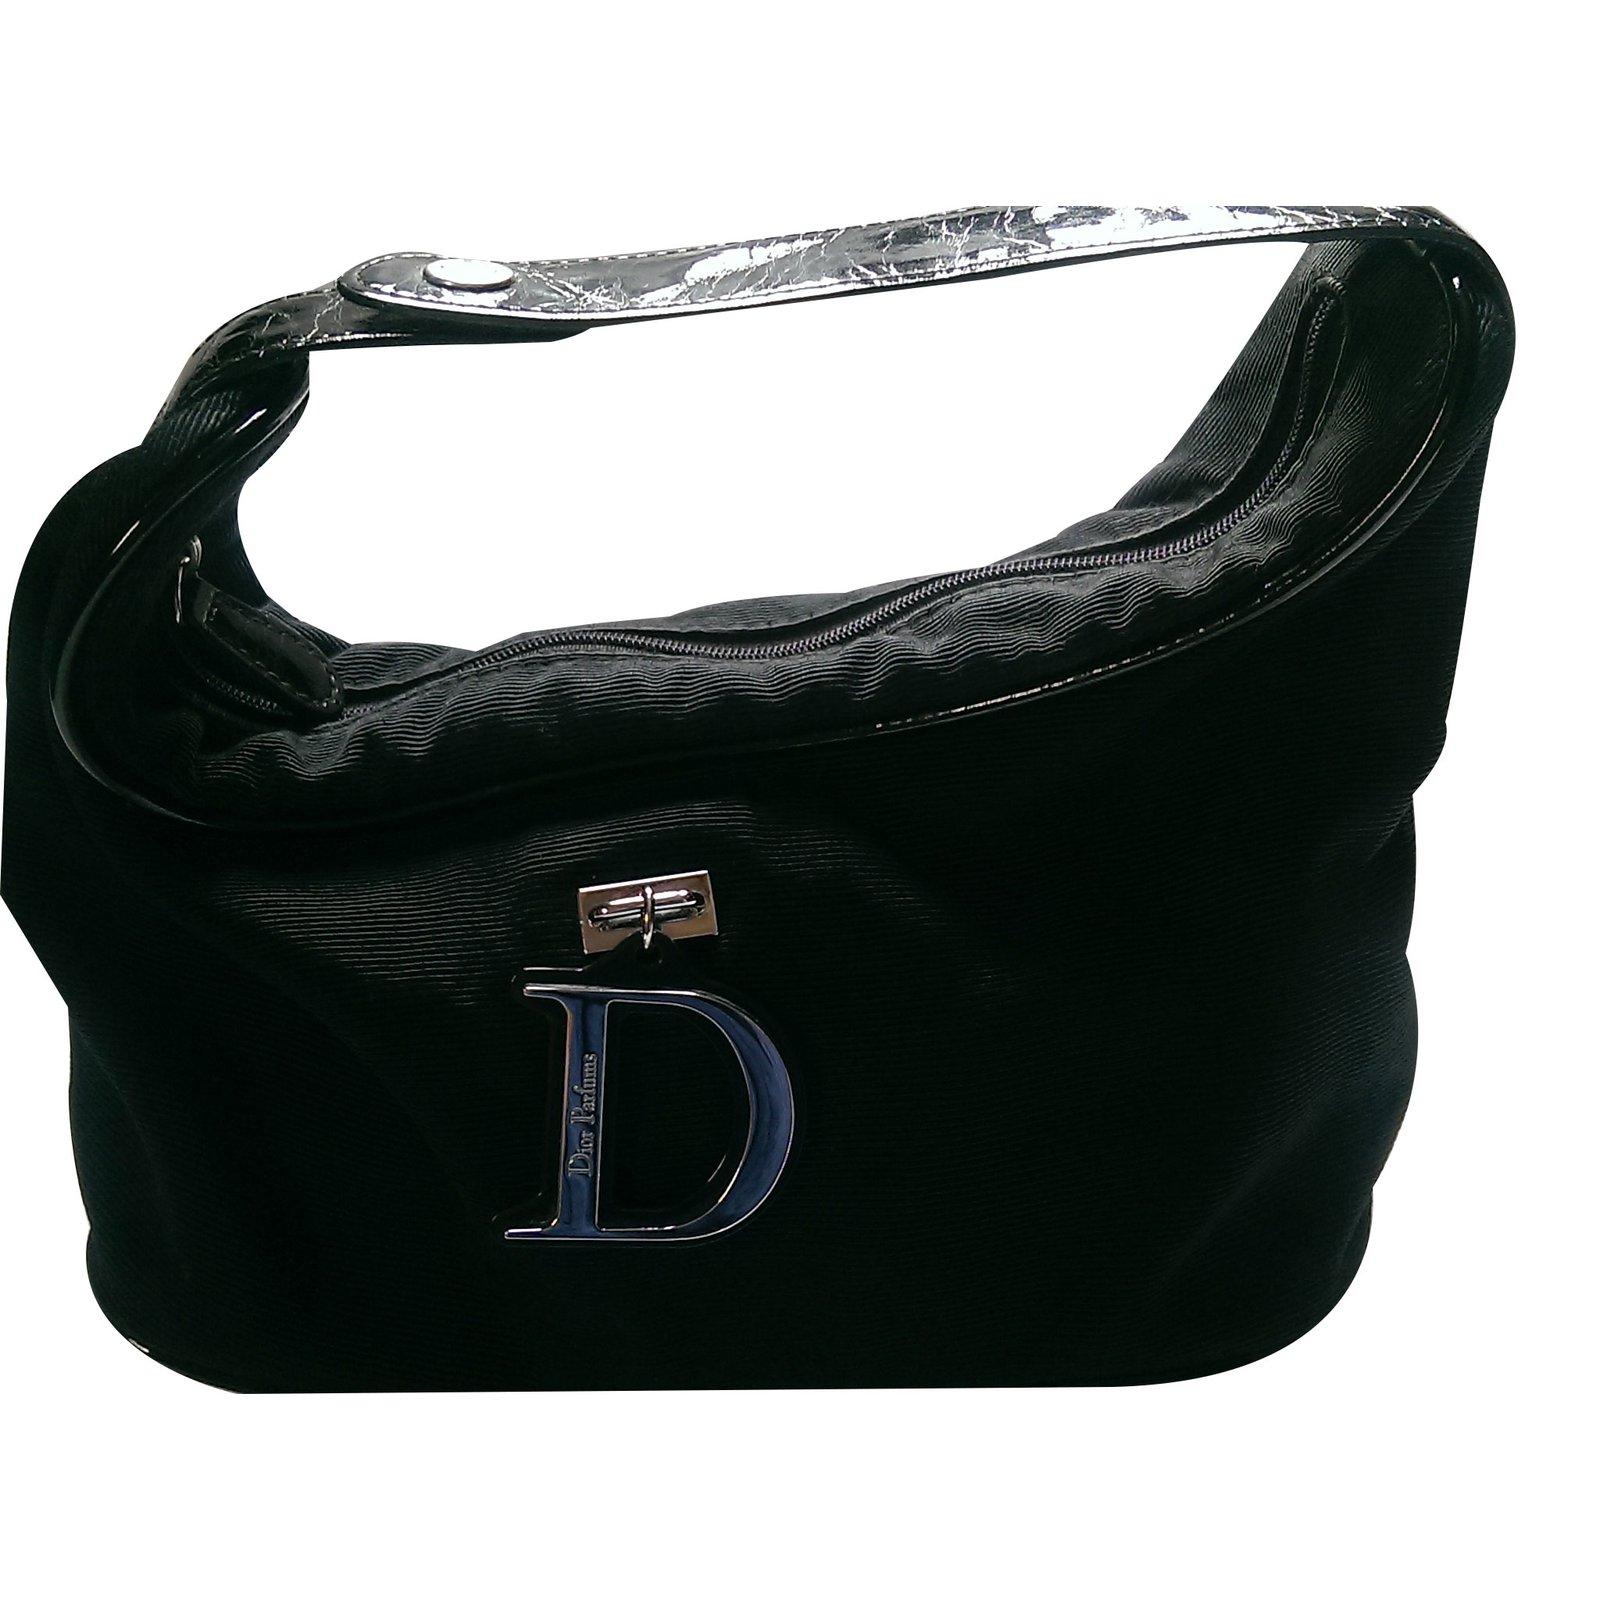 Christian Dior Purses Wallets Cases Purses Wallets Cases